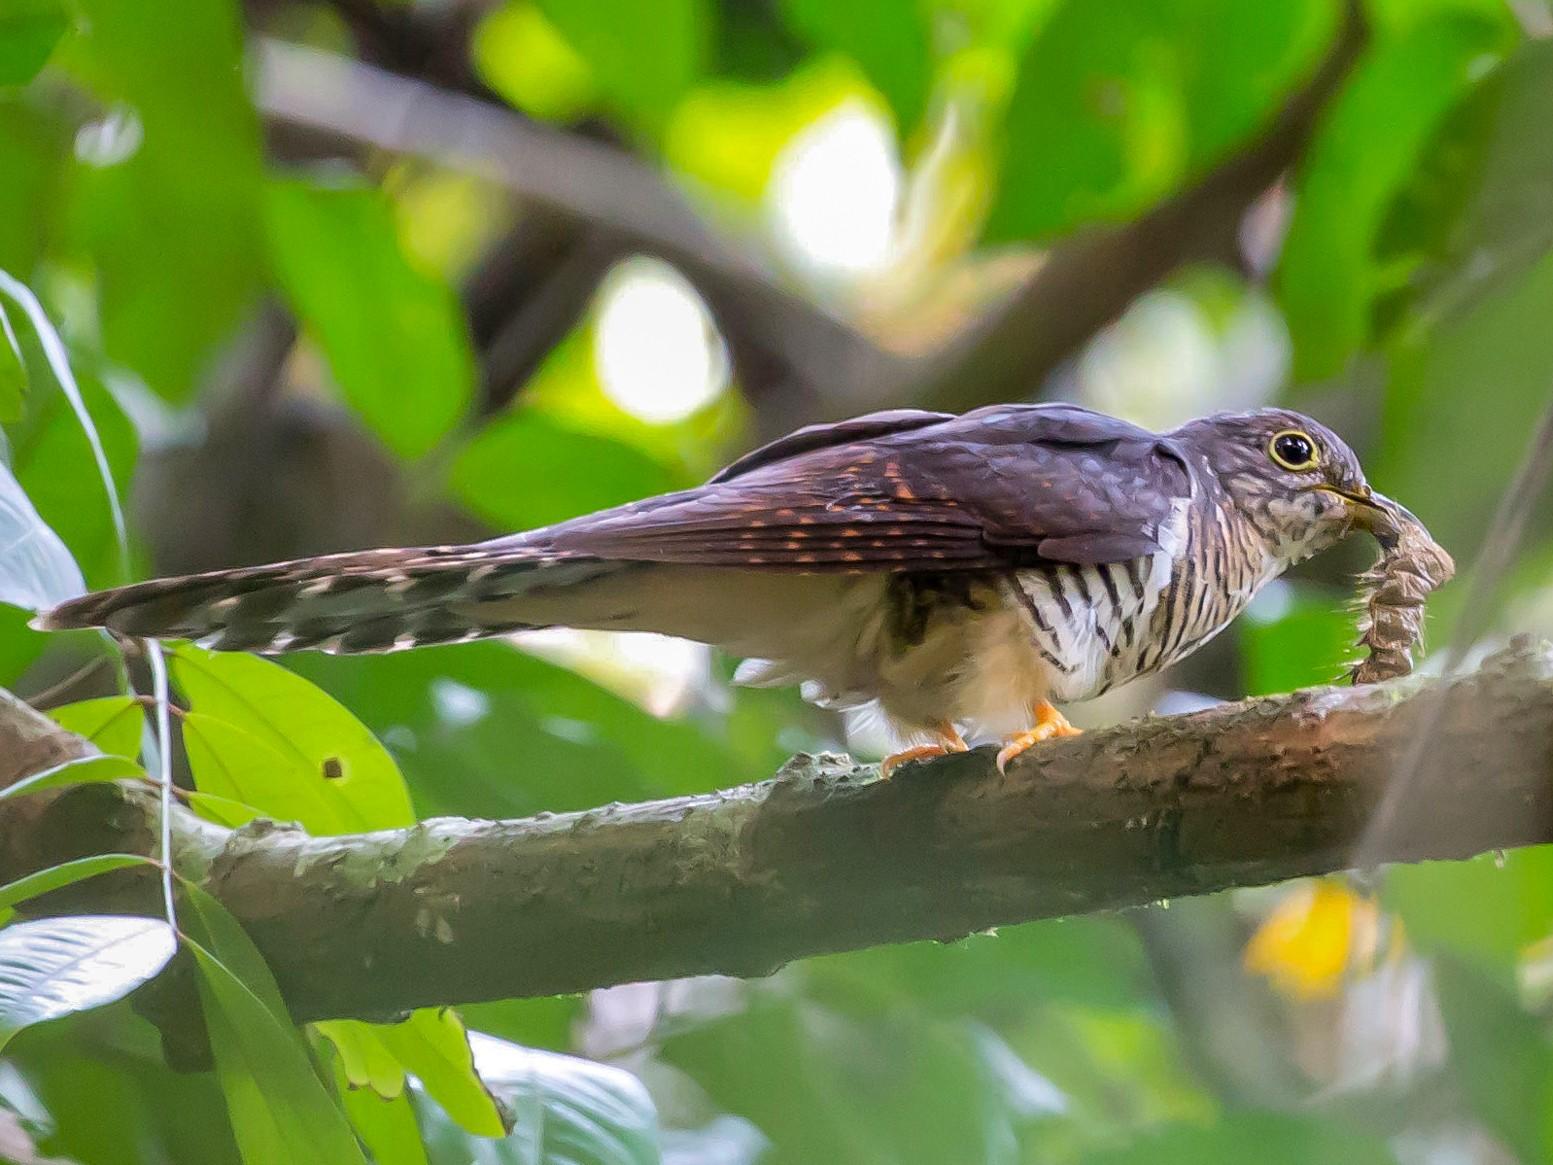 Olive Long-tailed Cuckoo - Jieles van Baalen